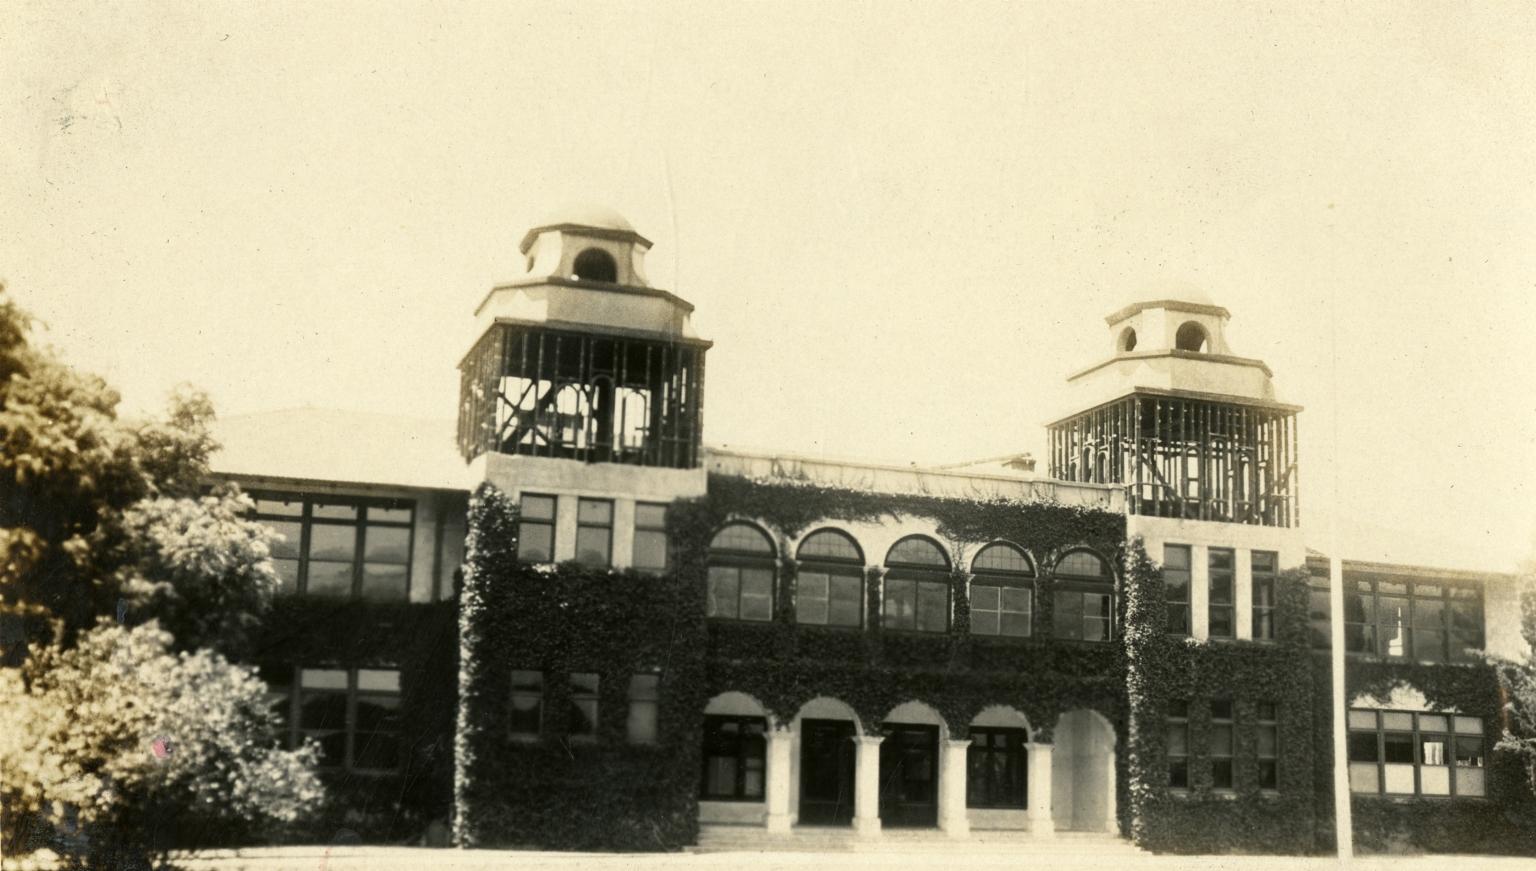 Santa Barbara 1925 Earthquake Damage - School